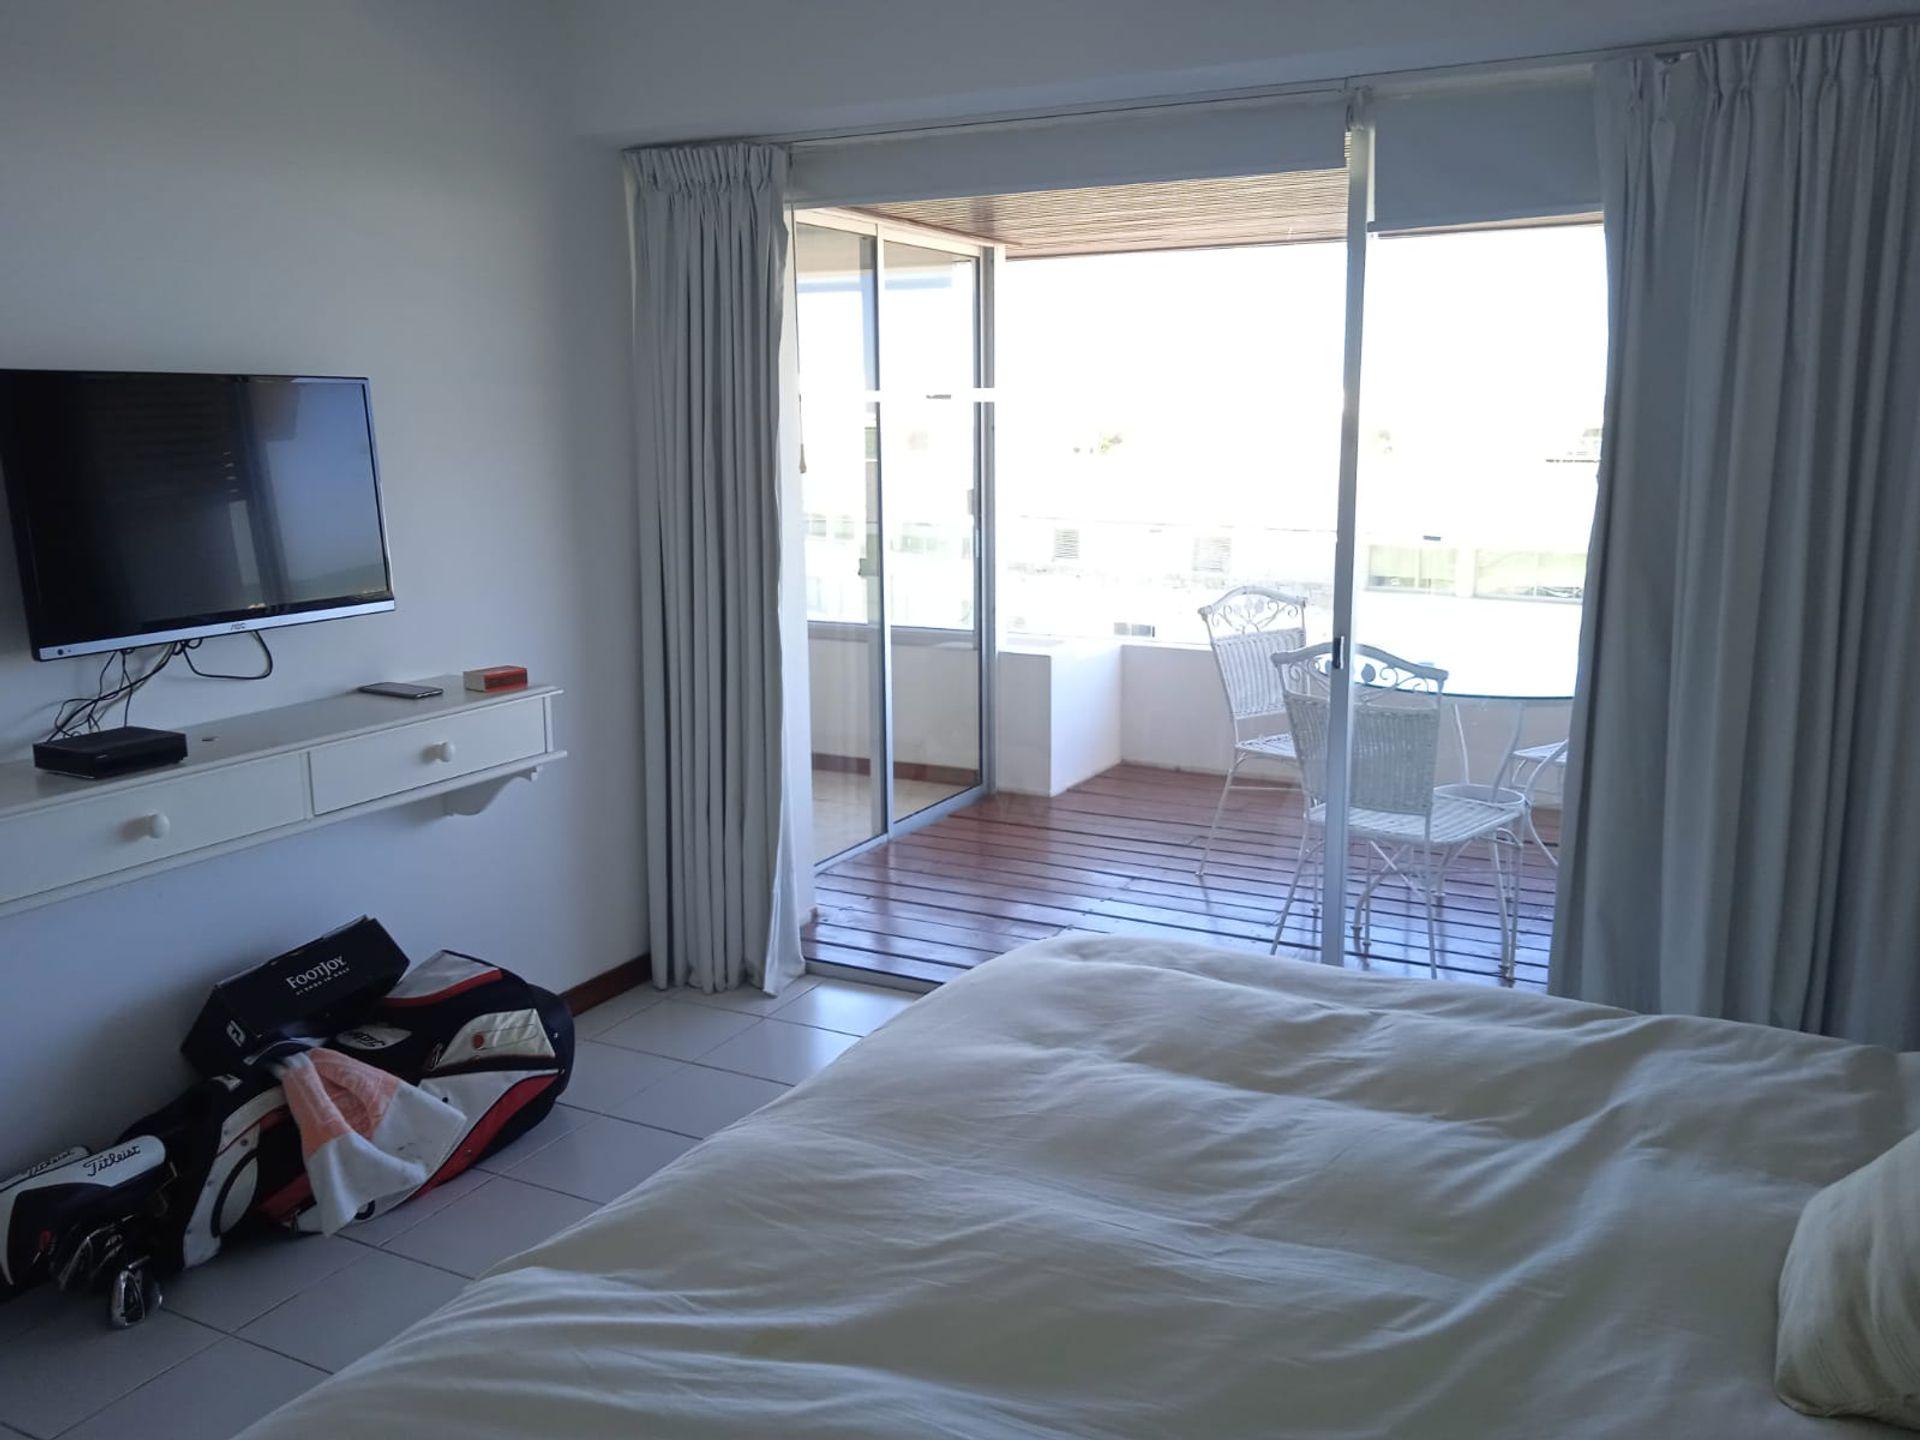 apartamento en roosevelt, maldonado. maldonado -  1 dormitorios - 1 baños